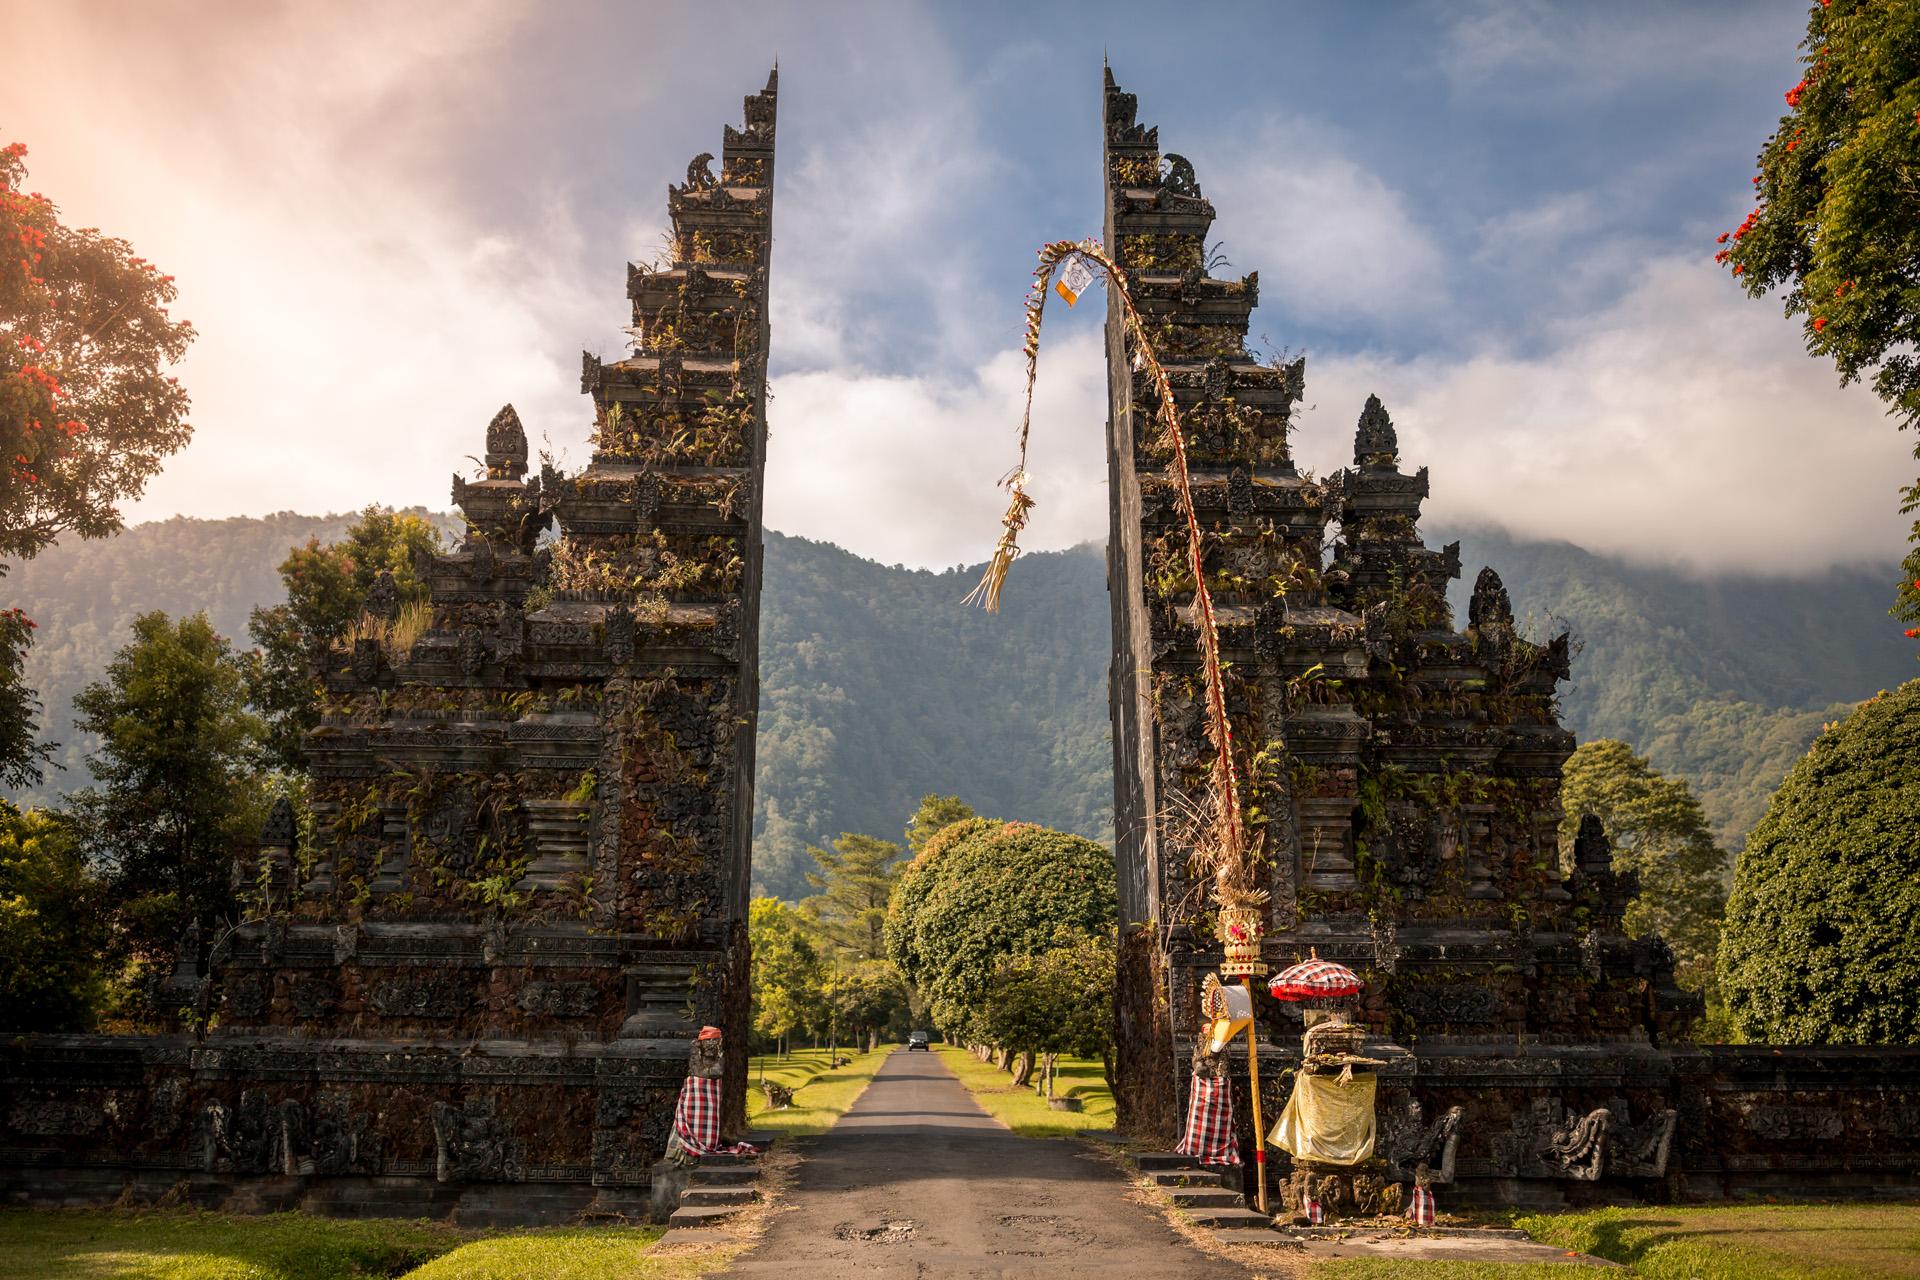 Handara Iconic Gate